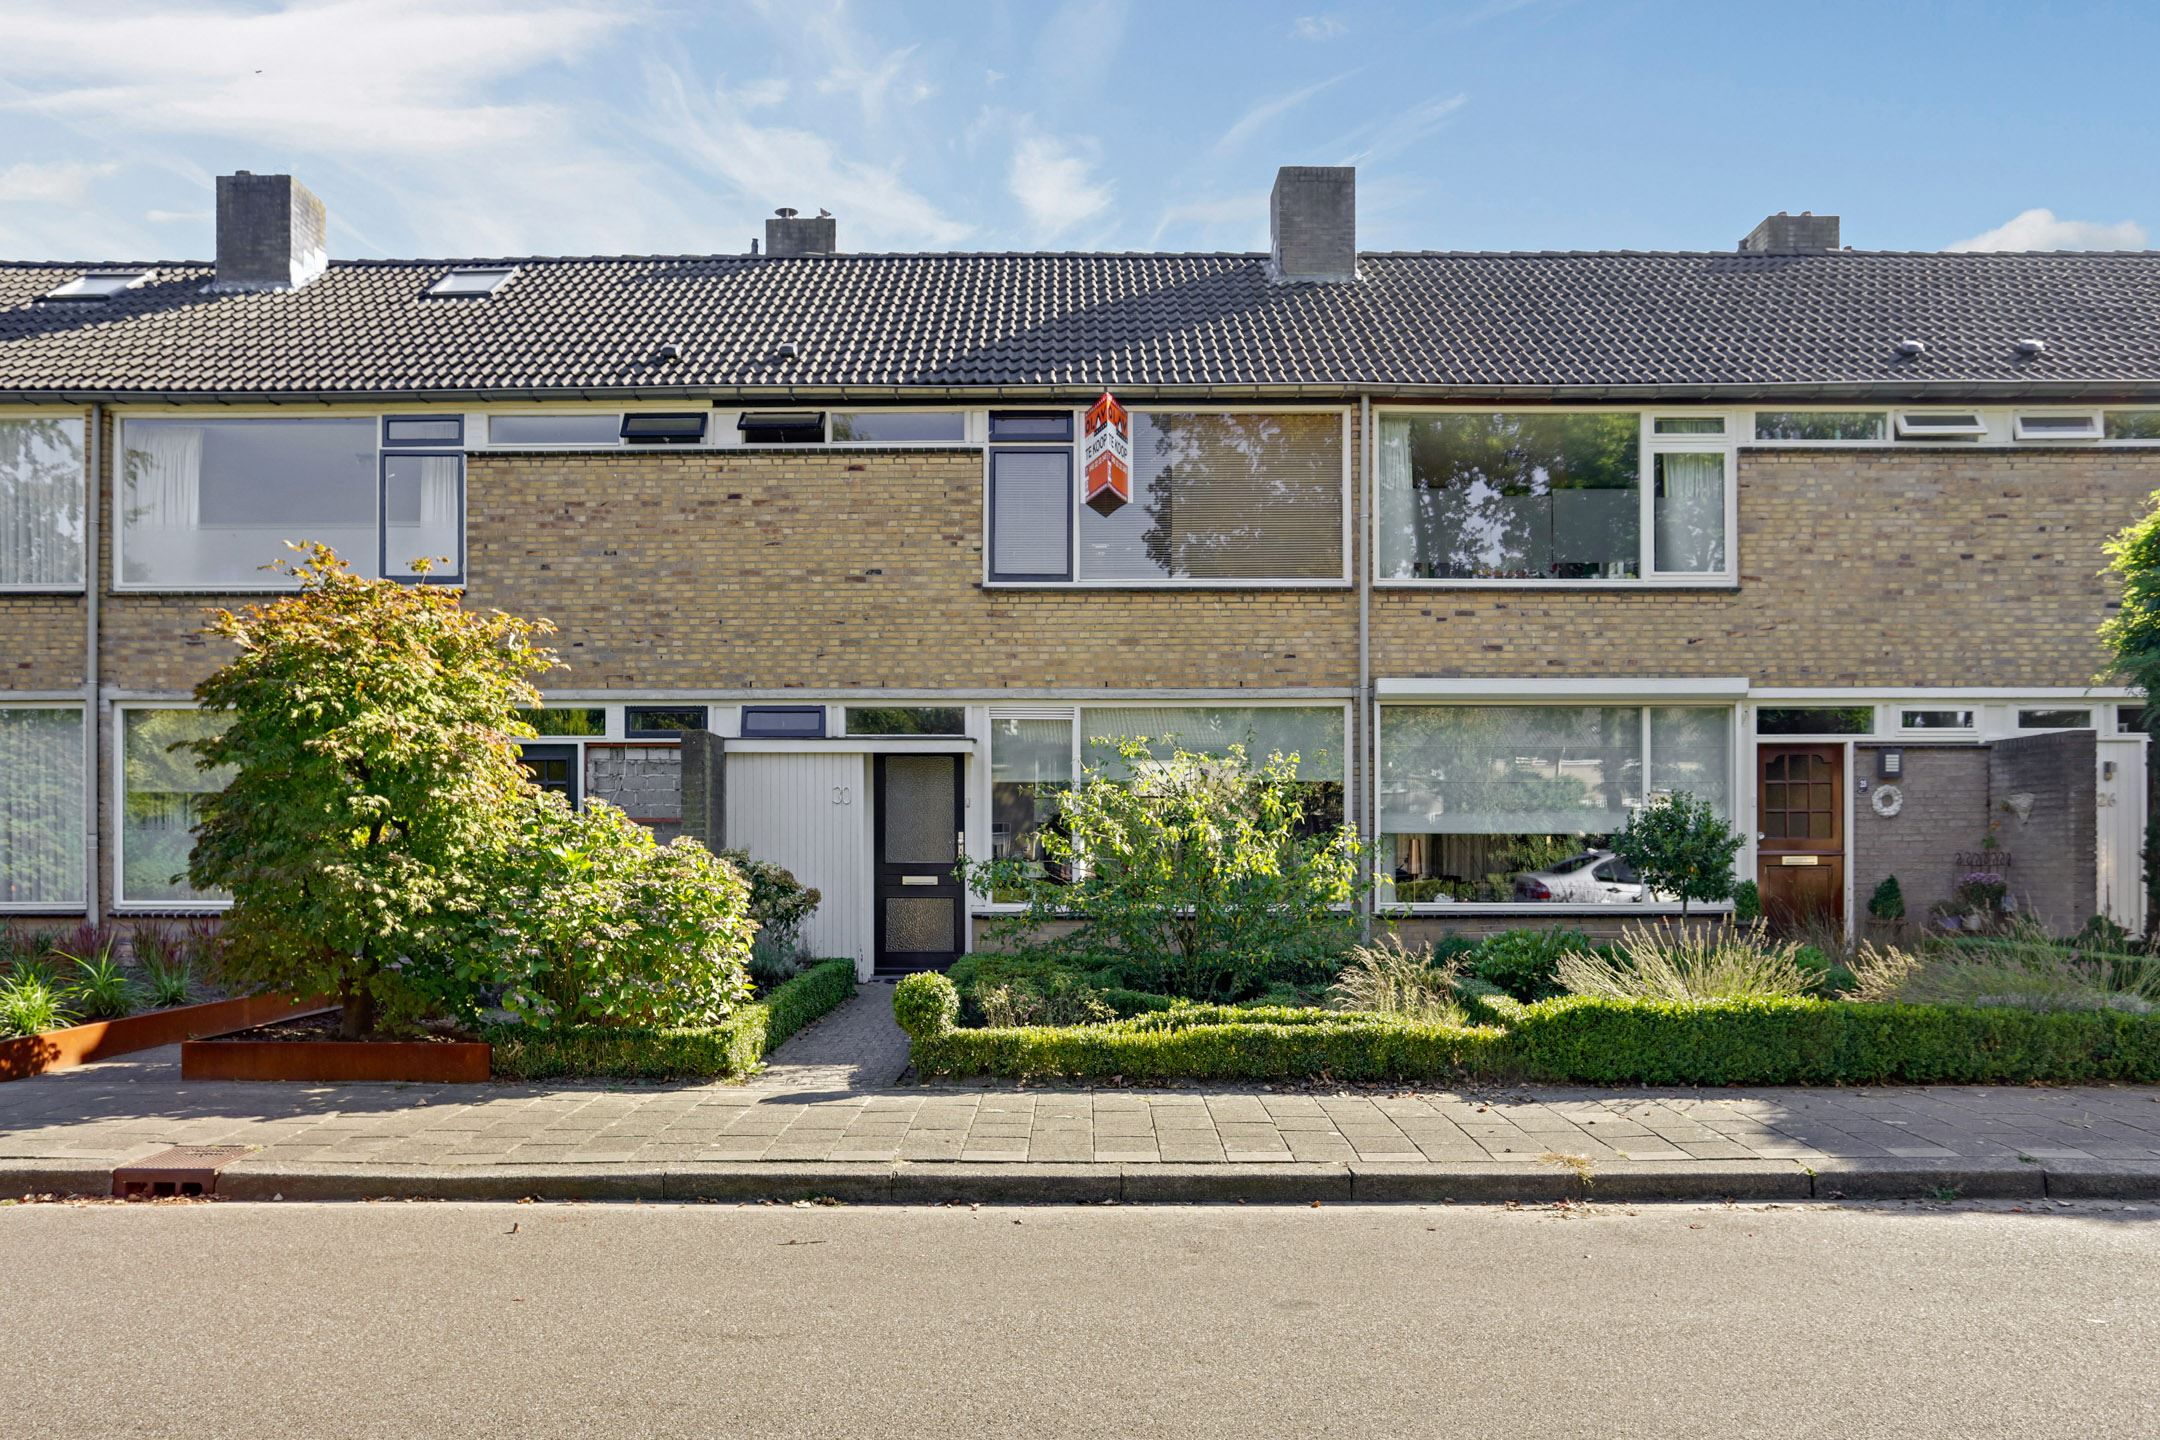 Huis te koop: Beukelaar 30 5664 XC Geldrop [funda]